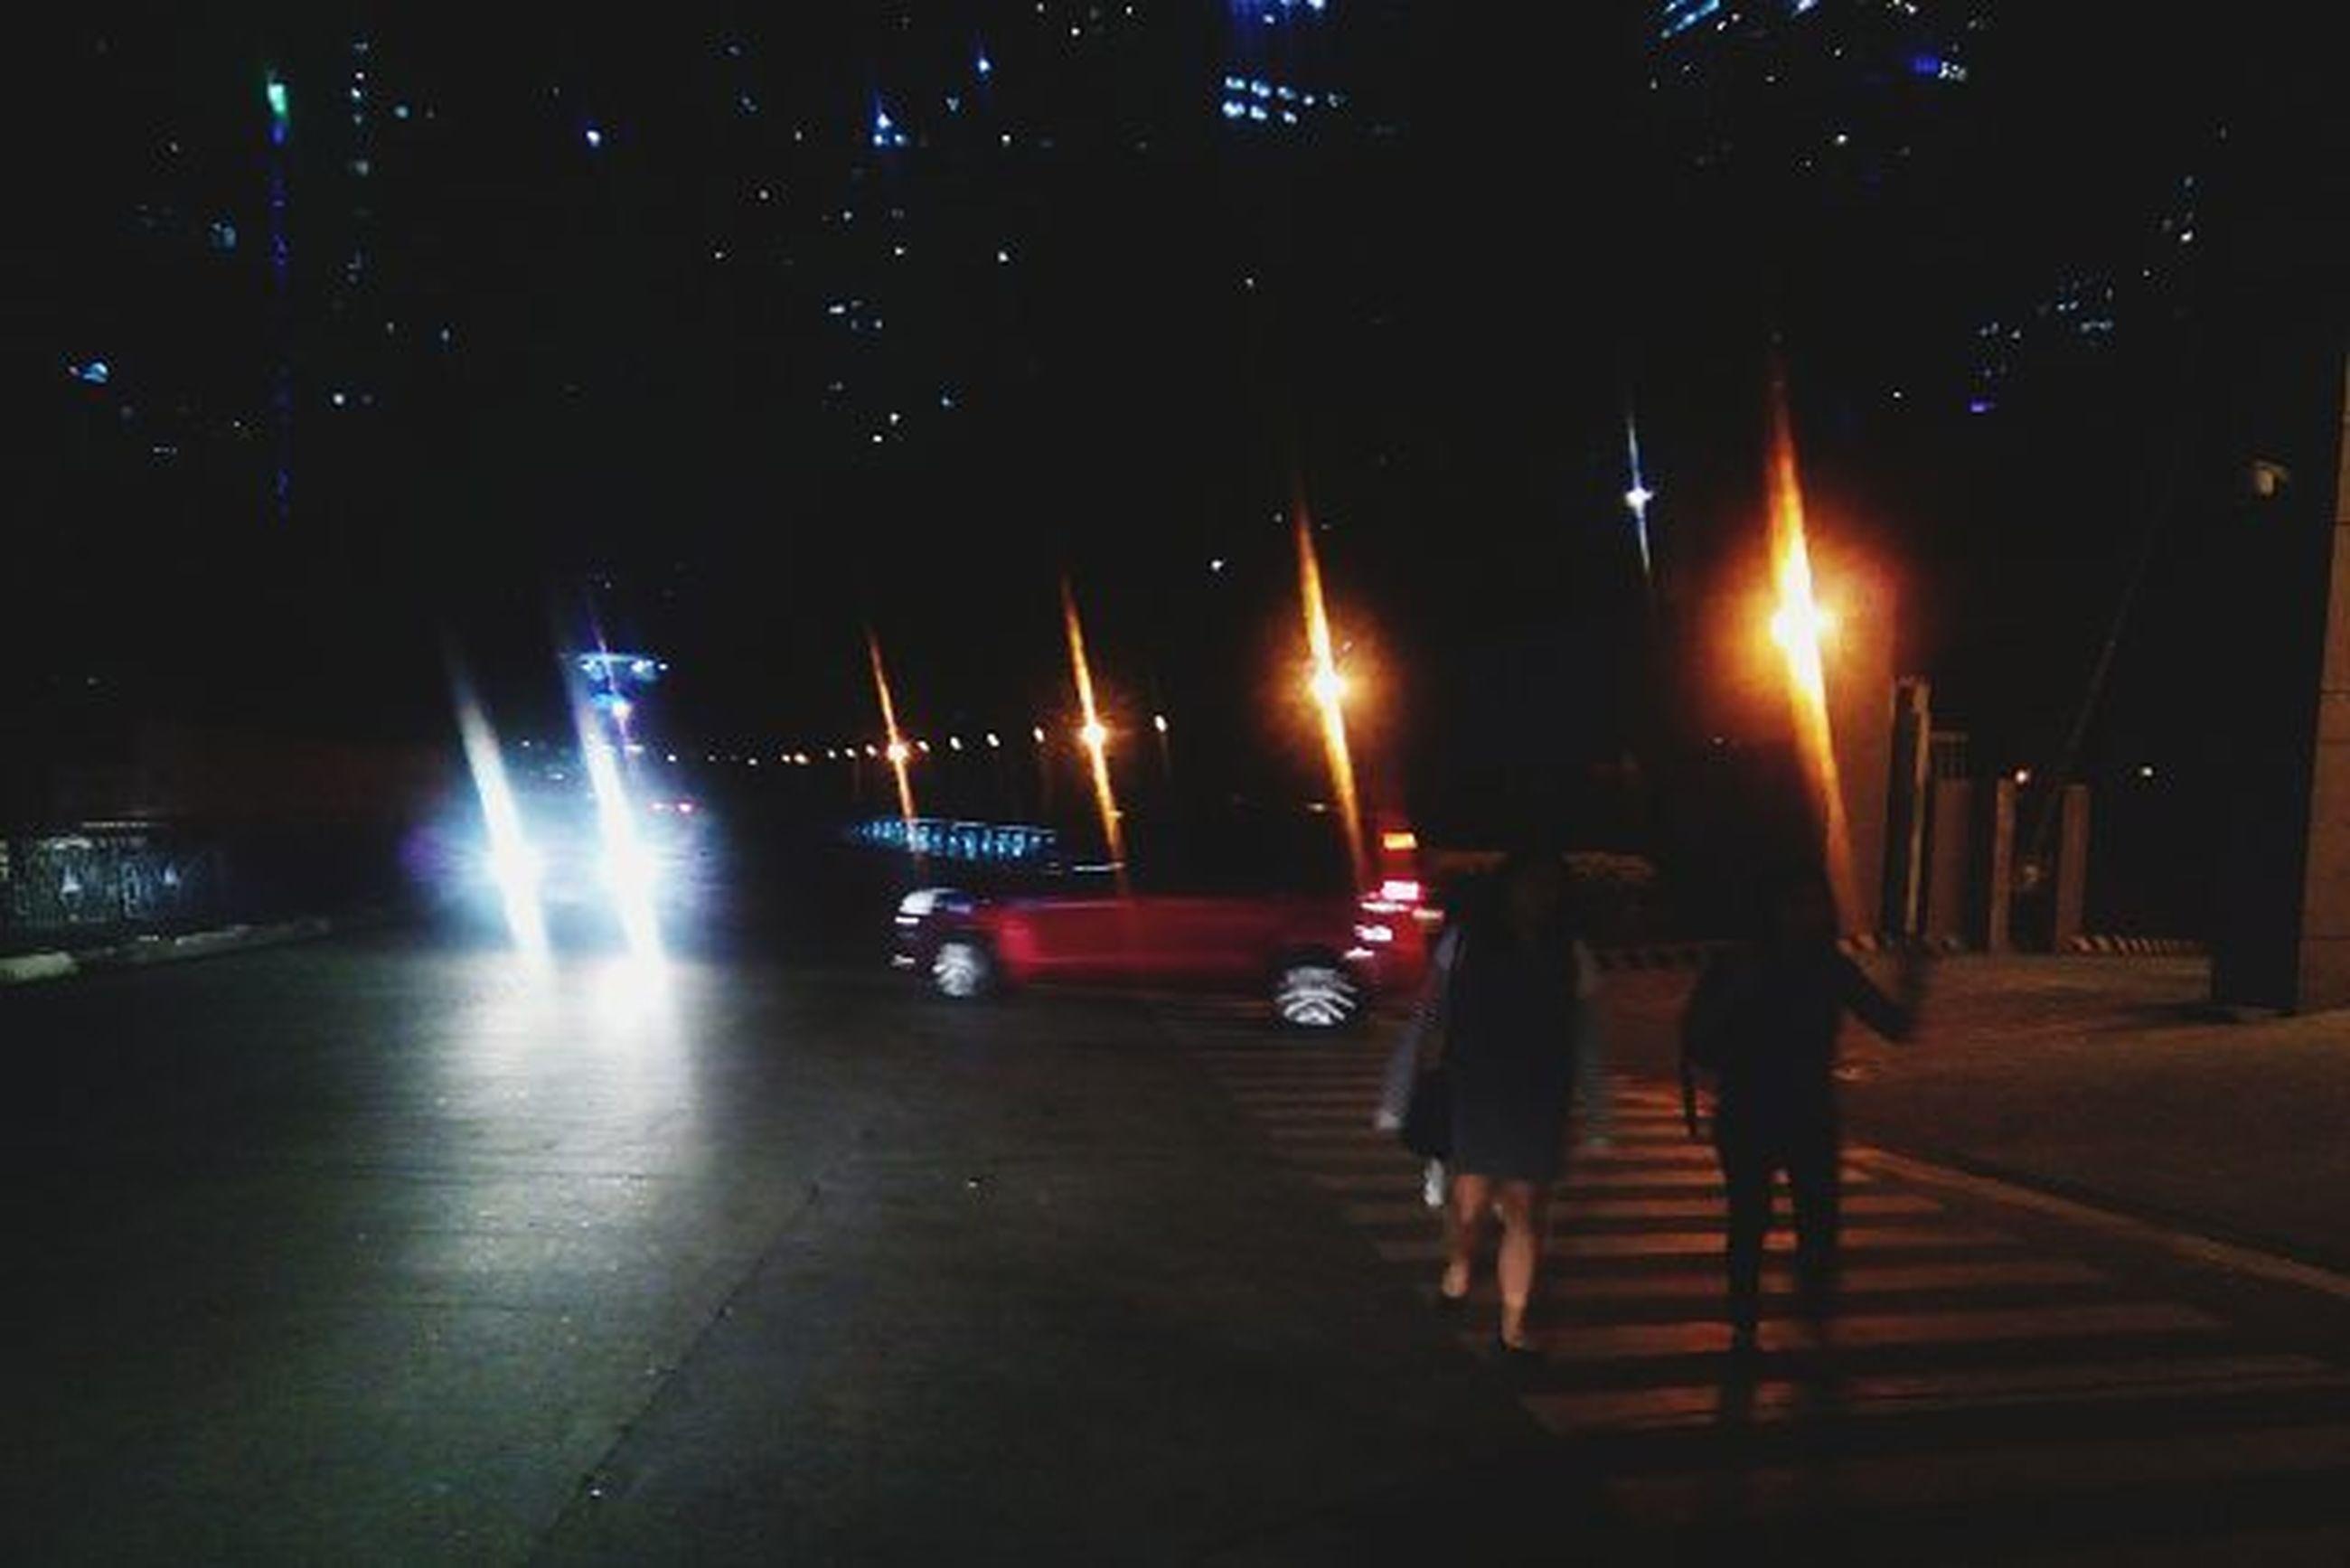 illuminated, night, transportation, men, lifestyles, walking, mode of transport, street light, street, full length, on the move, leisure activity, city life, road, lighting equipment, person, land vehicle, rear view, the way forward